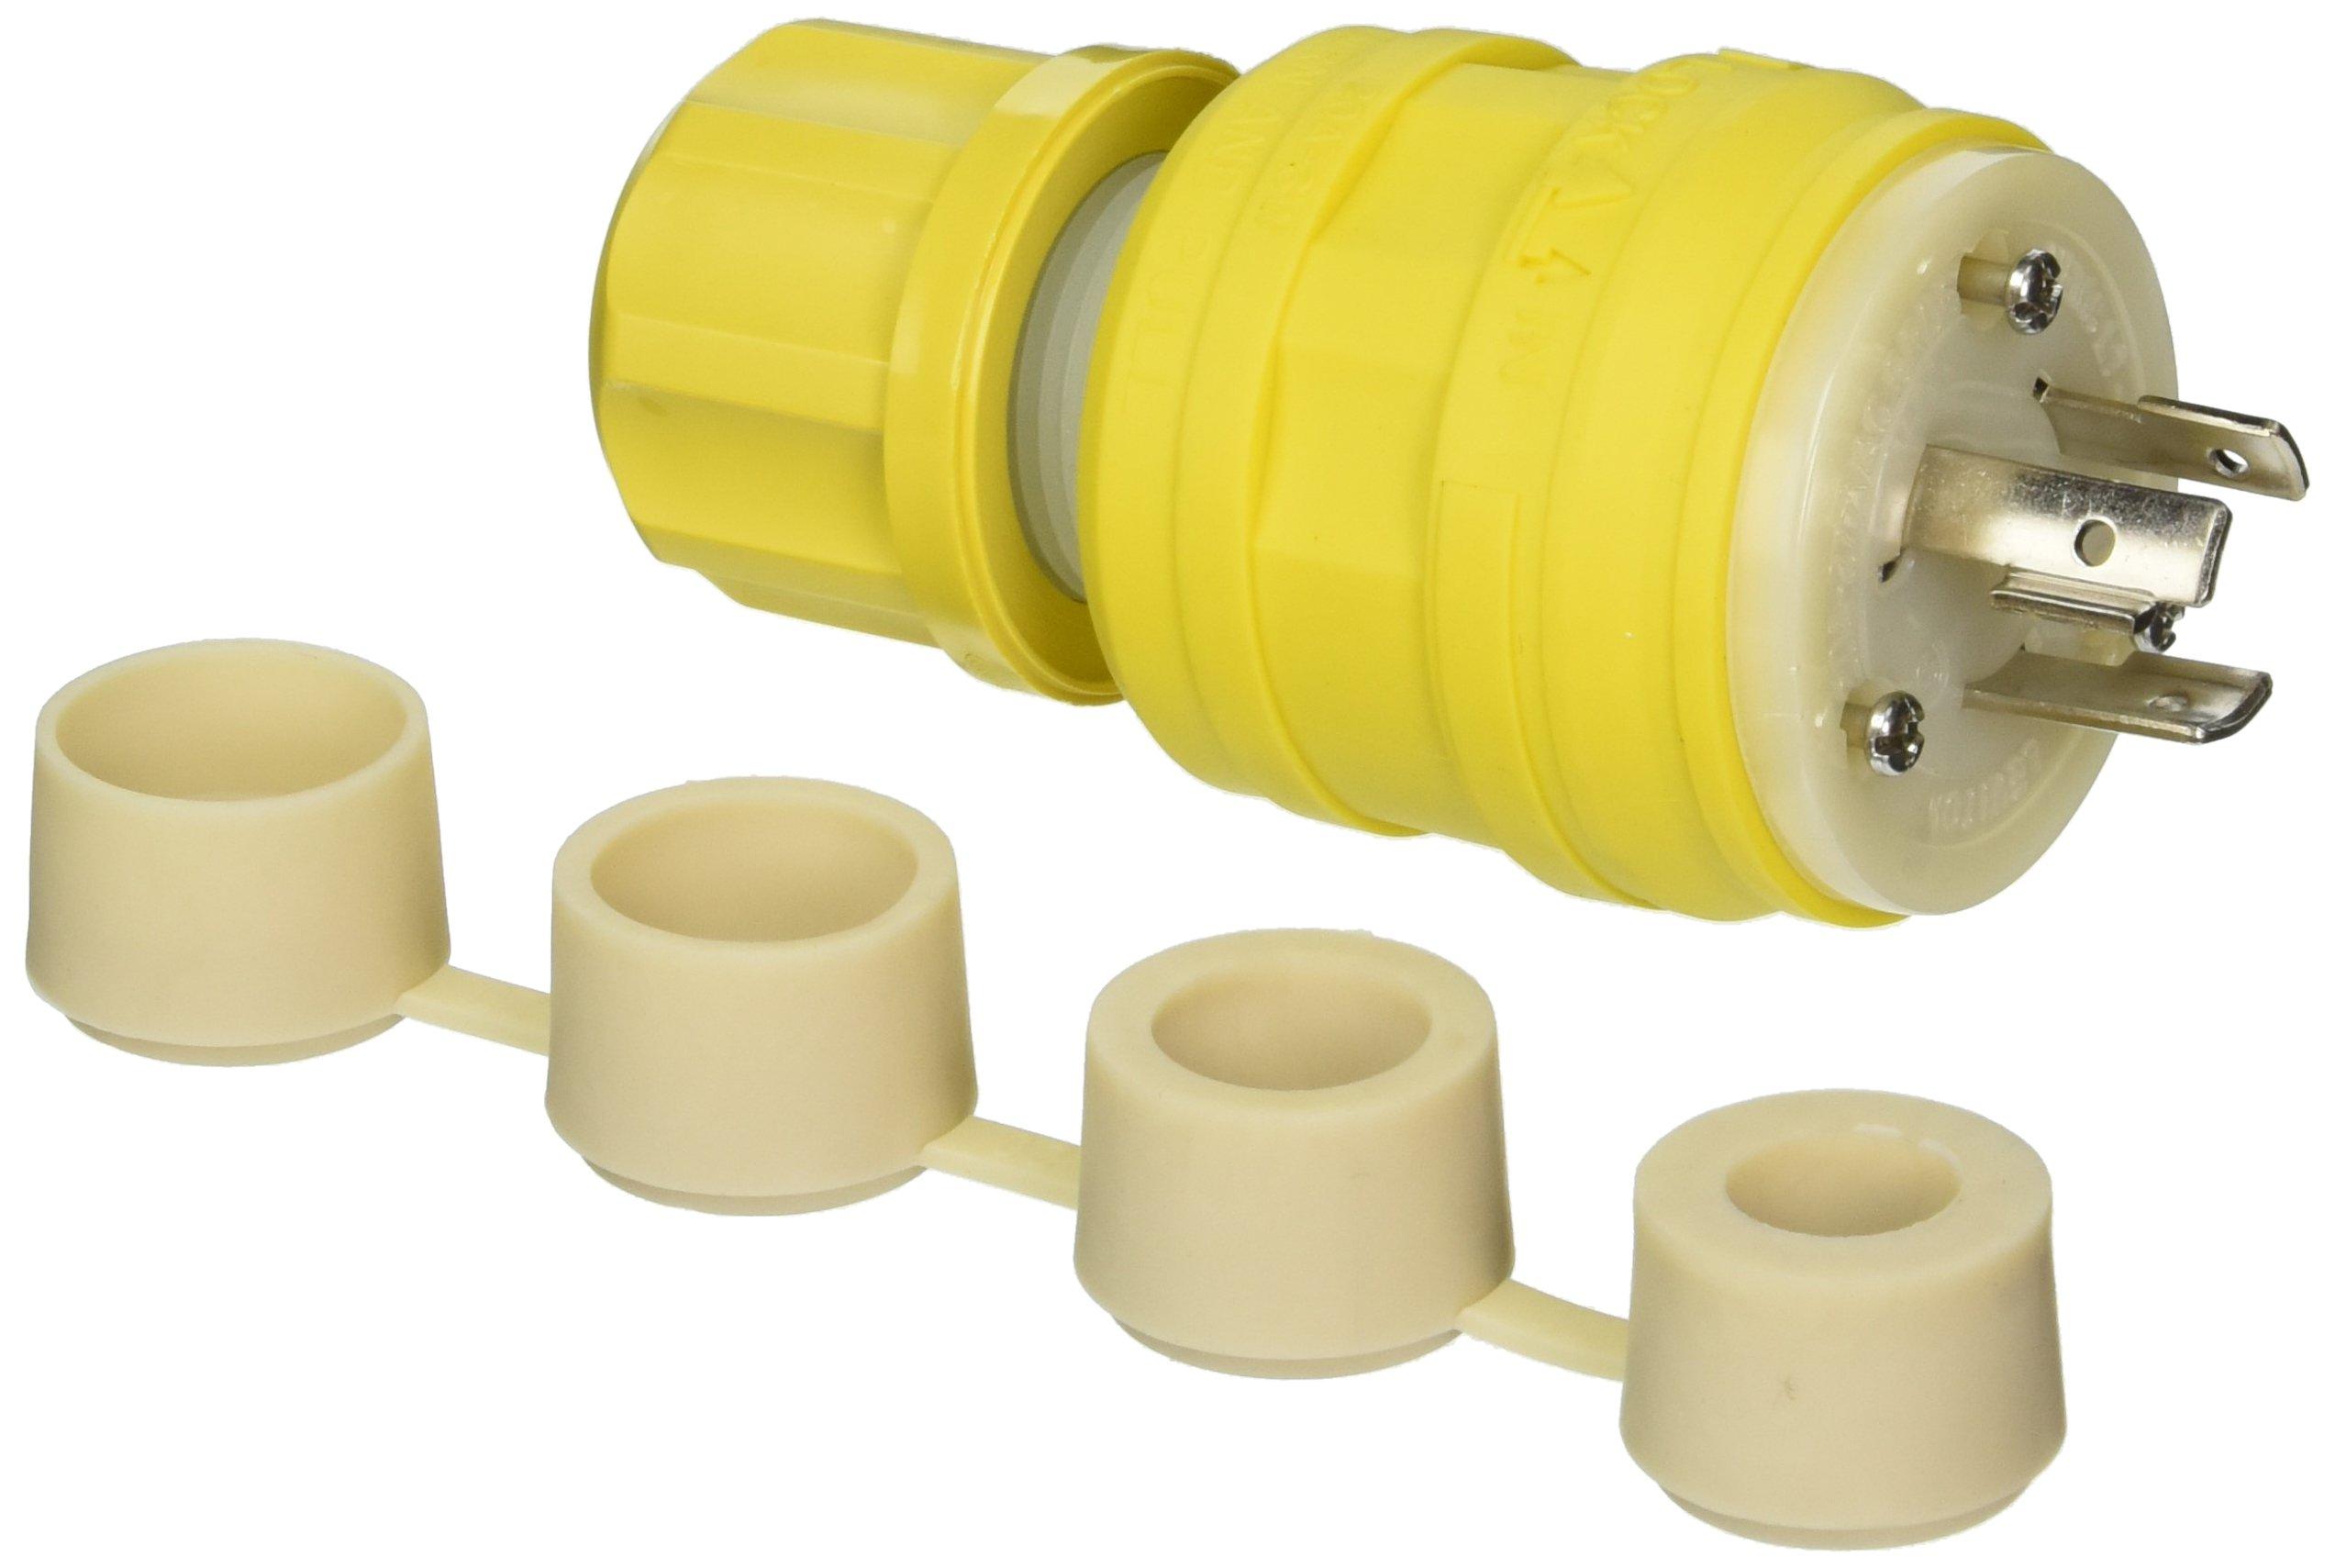 Leviton 26W49 20-Amp, 277-Volt, NEMA L7-20P, 2P, 3W, Locking Plug, Industrial Grade, Grounding, Wetguard, Yellow